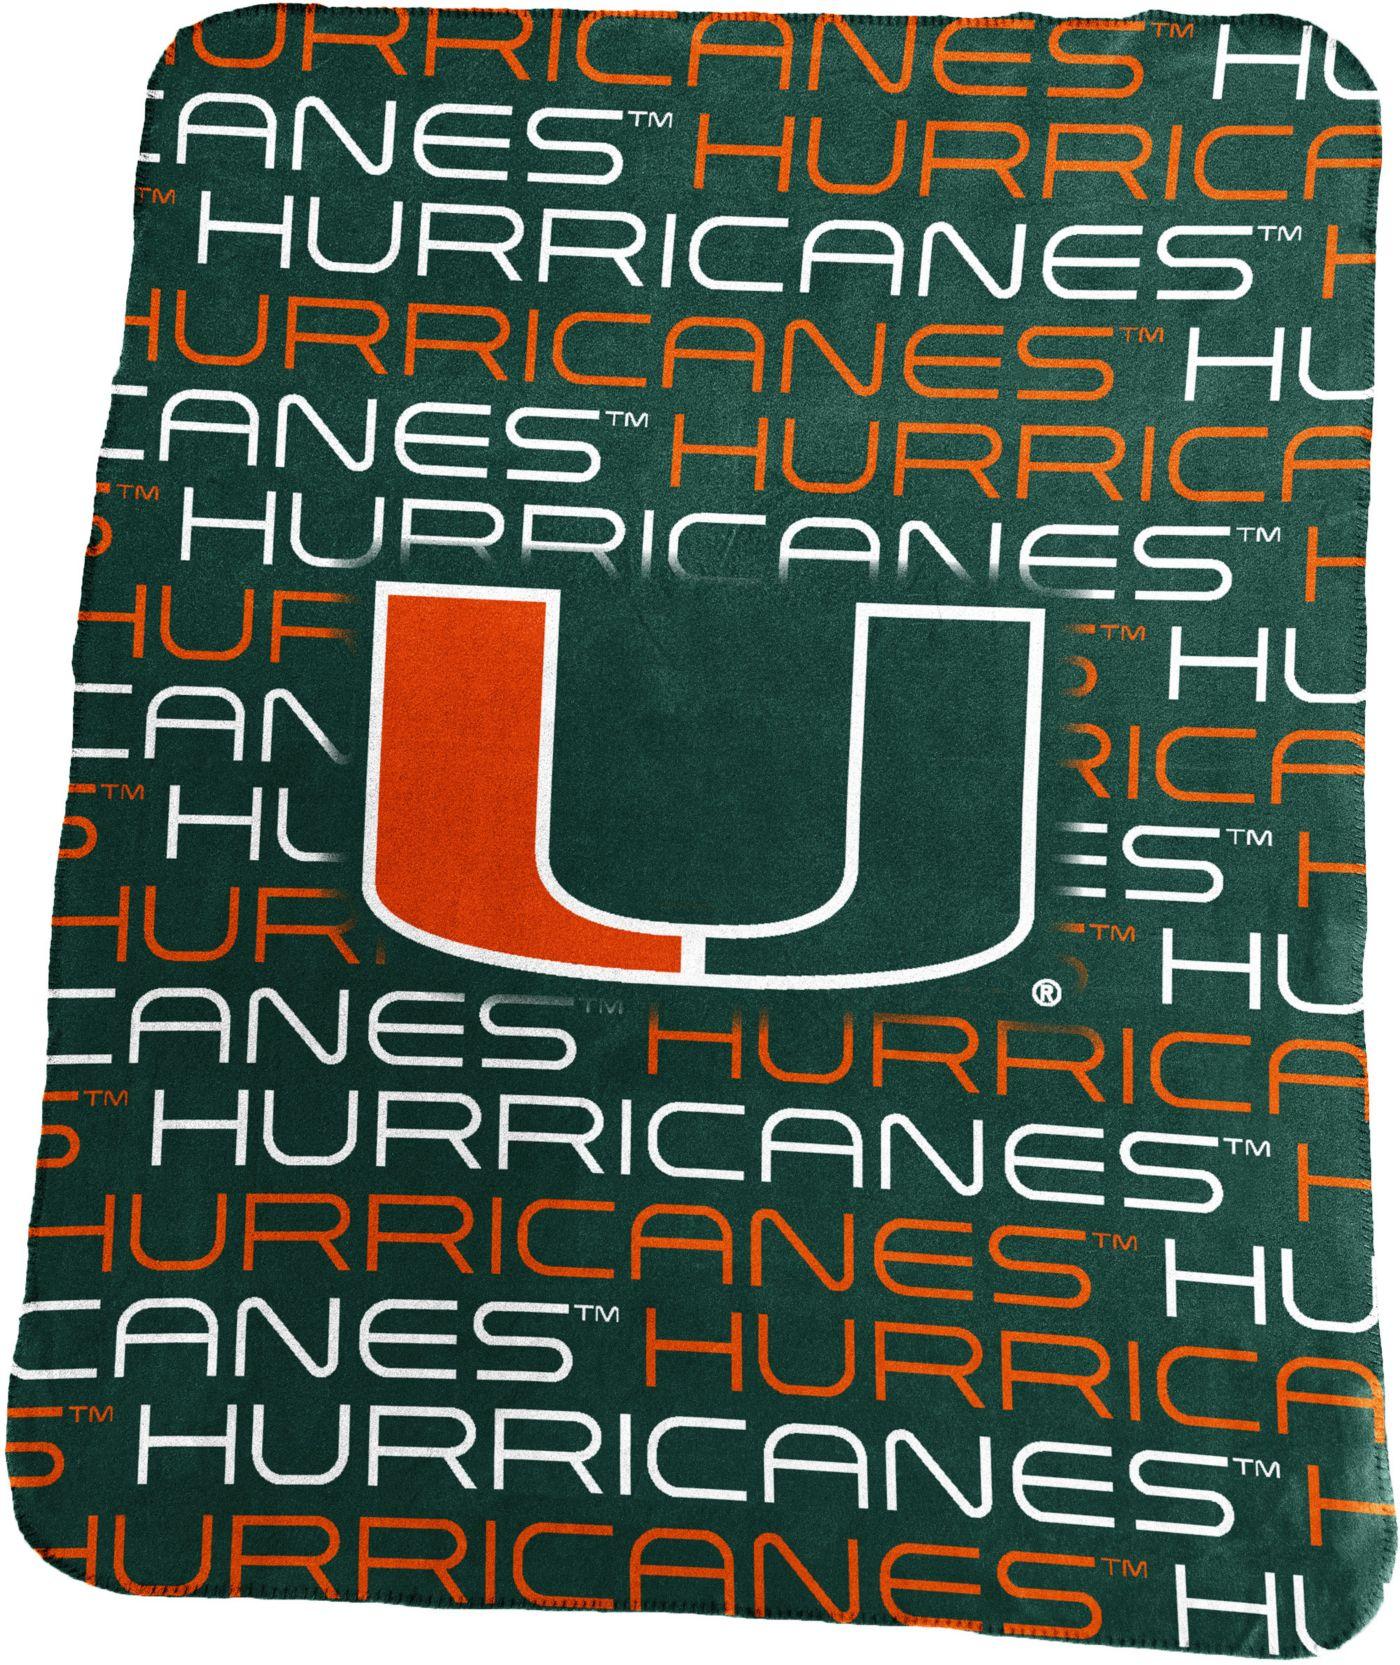 Miami Hurricanes Classic Fleece Blanket